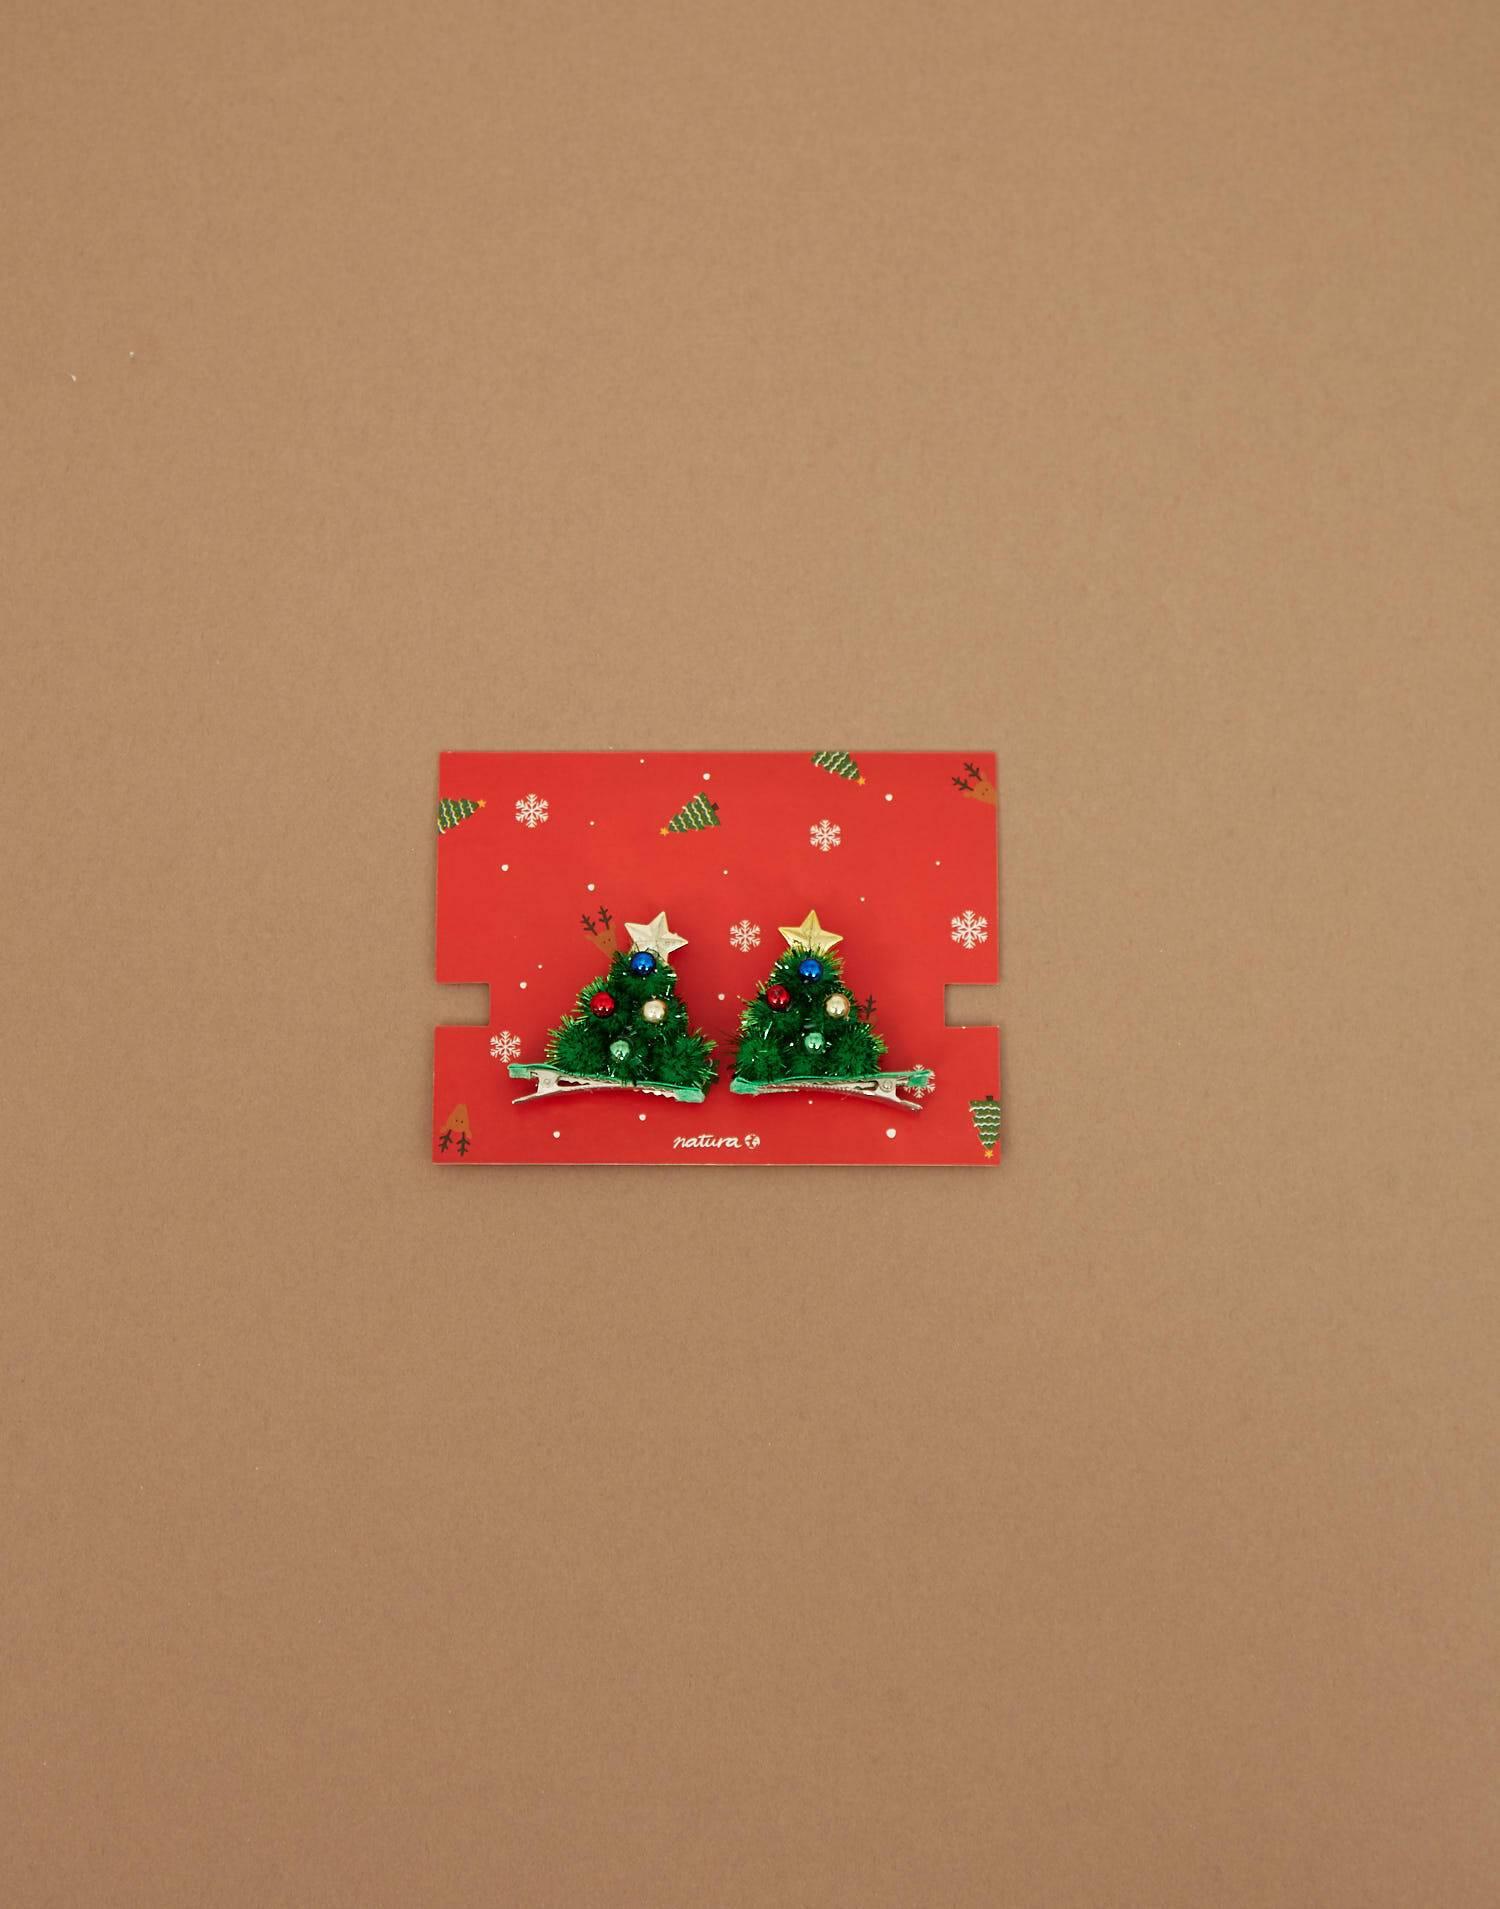 Clips árbol navidad